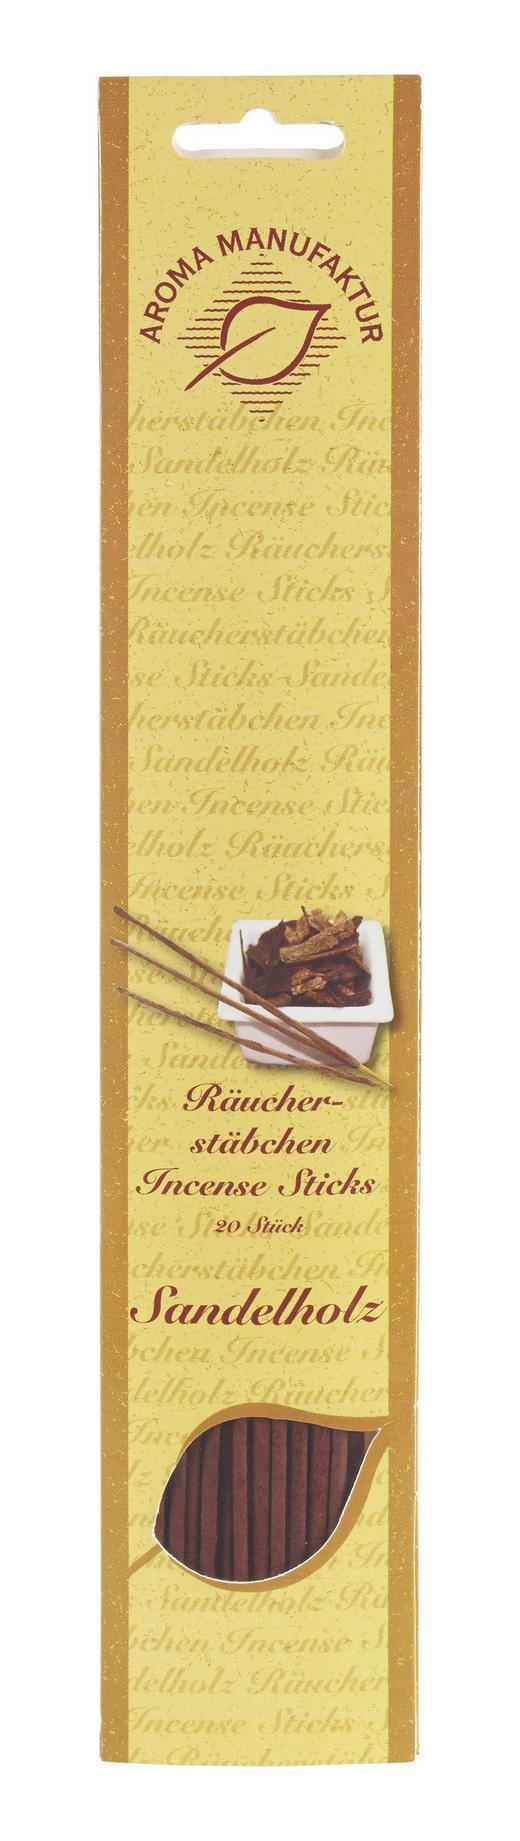 RÄUCHERSTÄBCHEN SANDELHOLZ - Hellbraun, Basics, Holz (32/6,5/0,5cm)